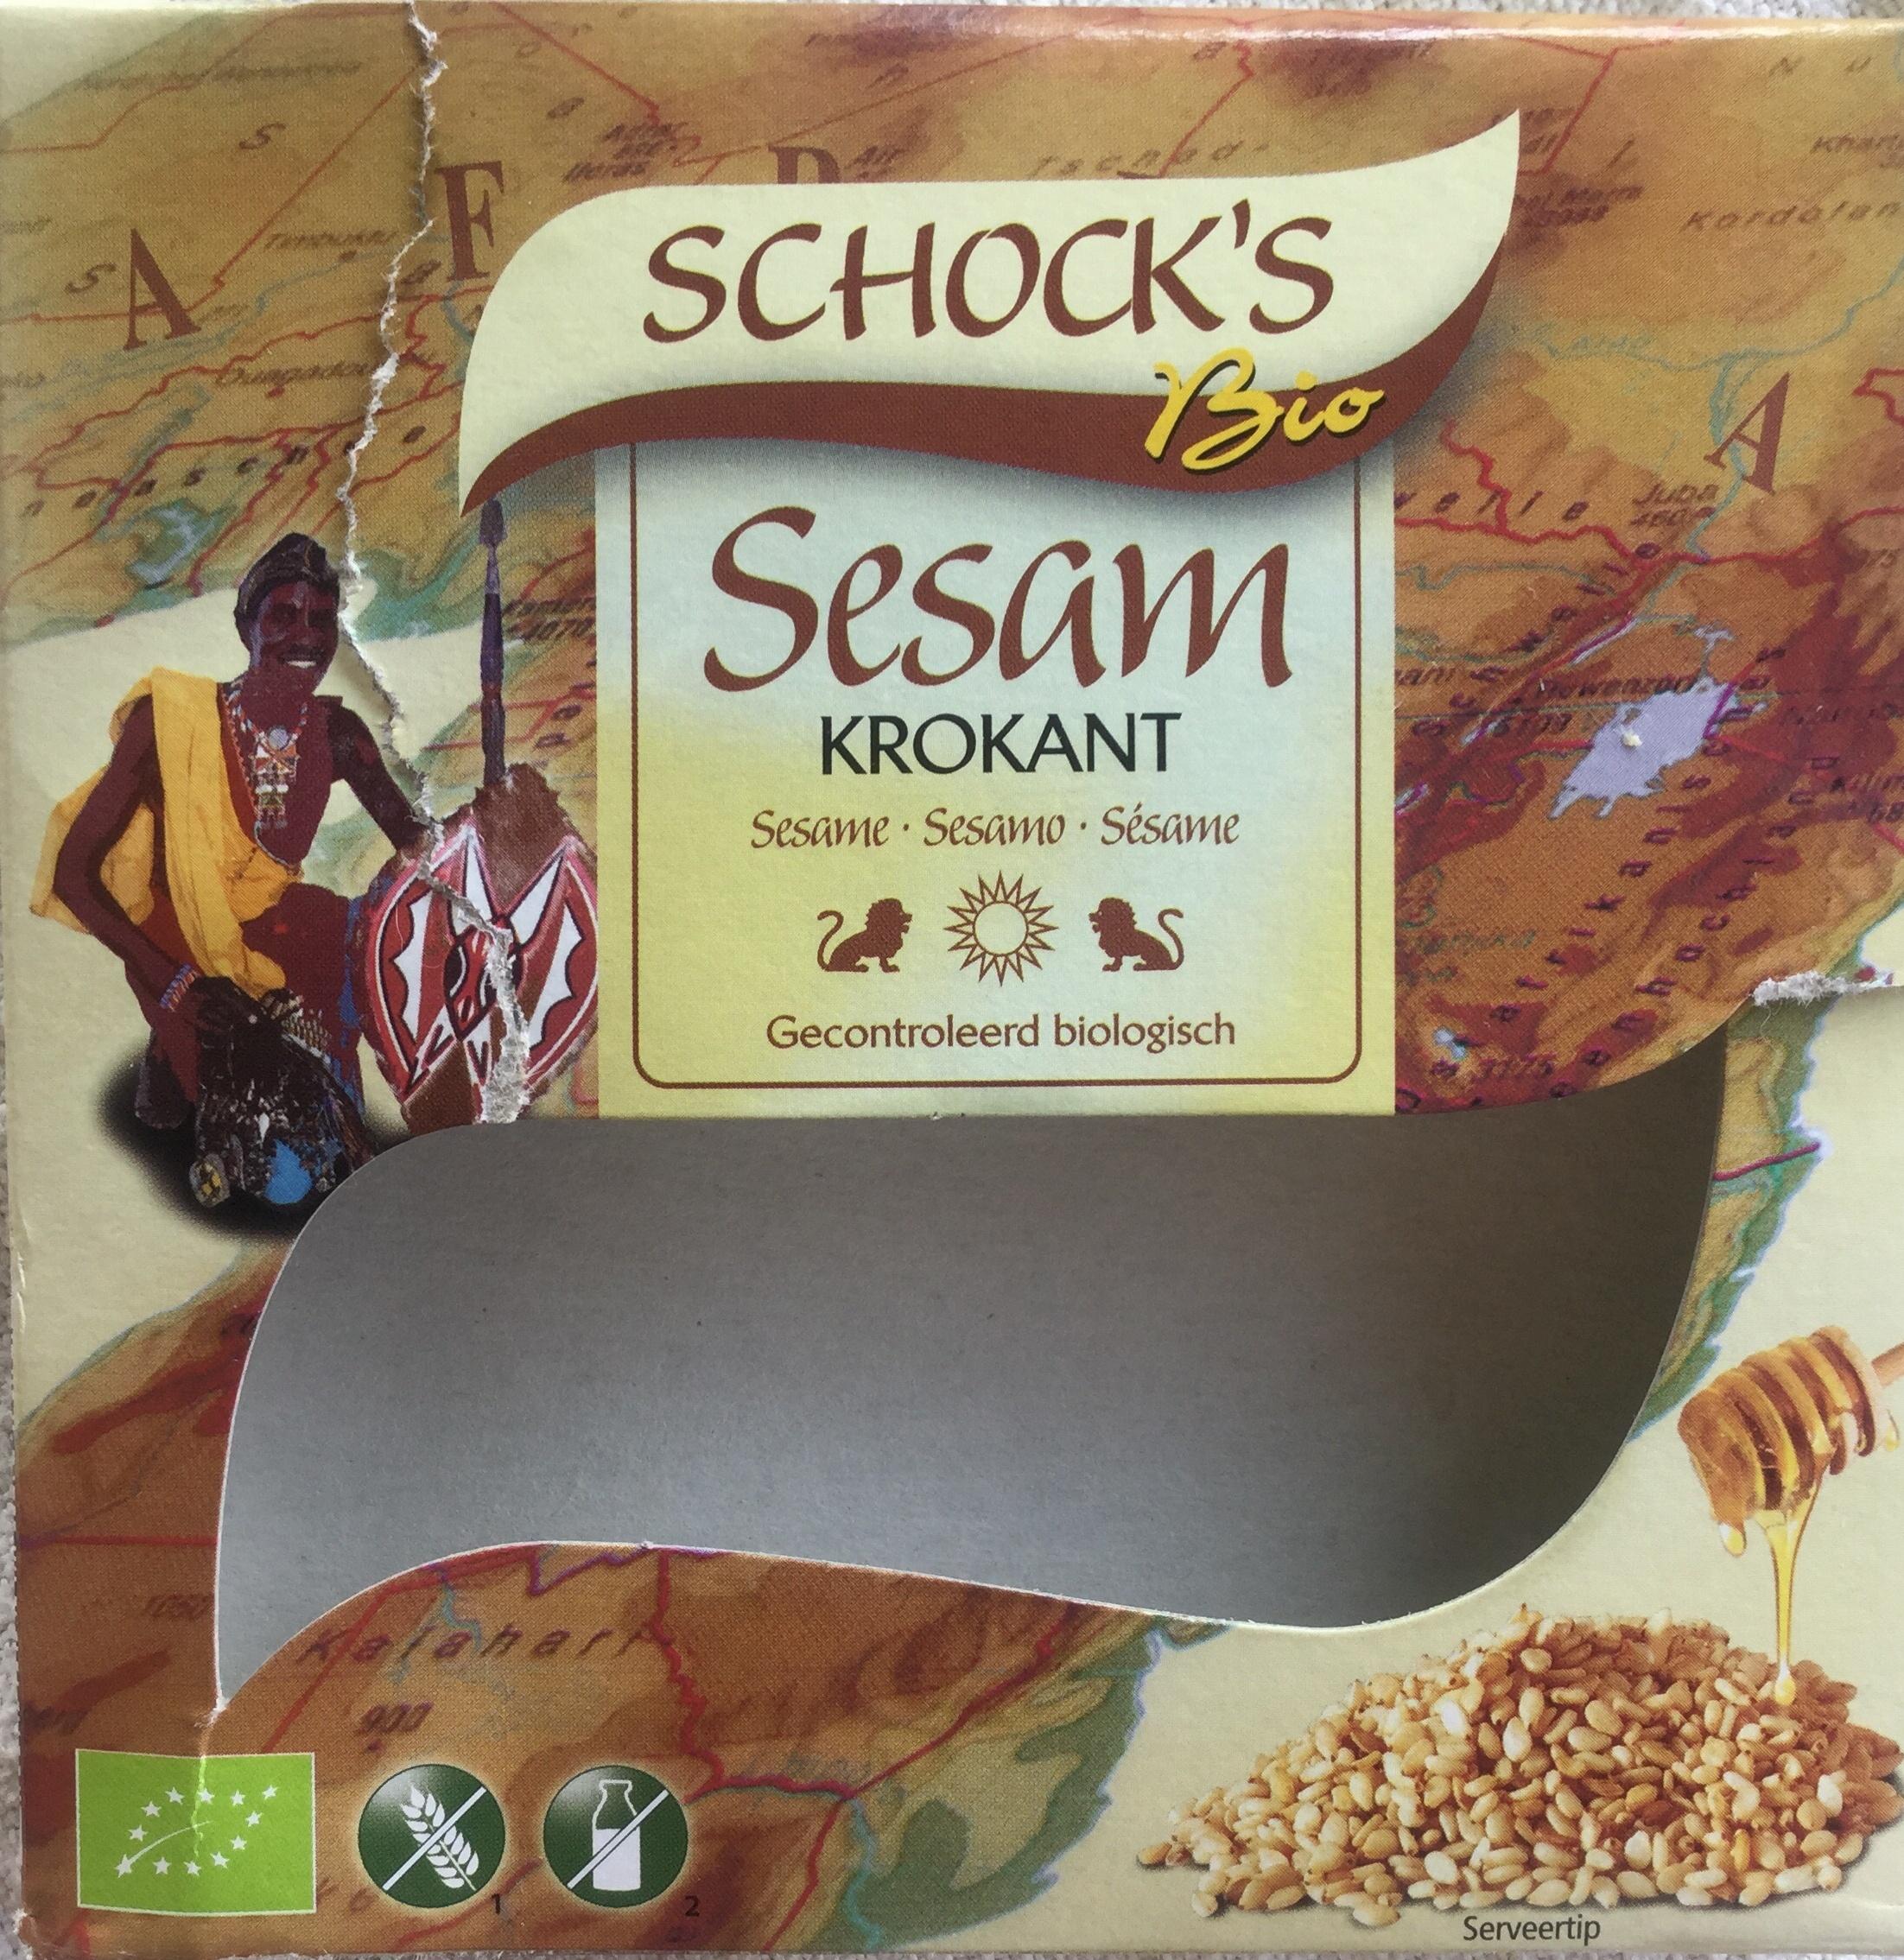 Sesam krokant - Product - nl